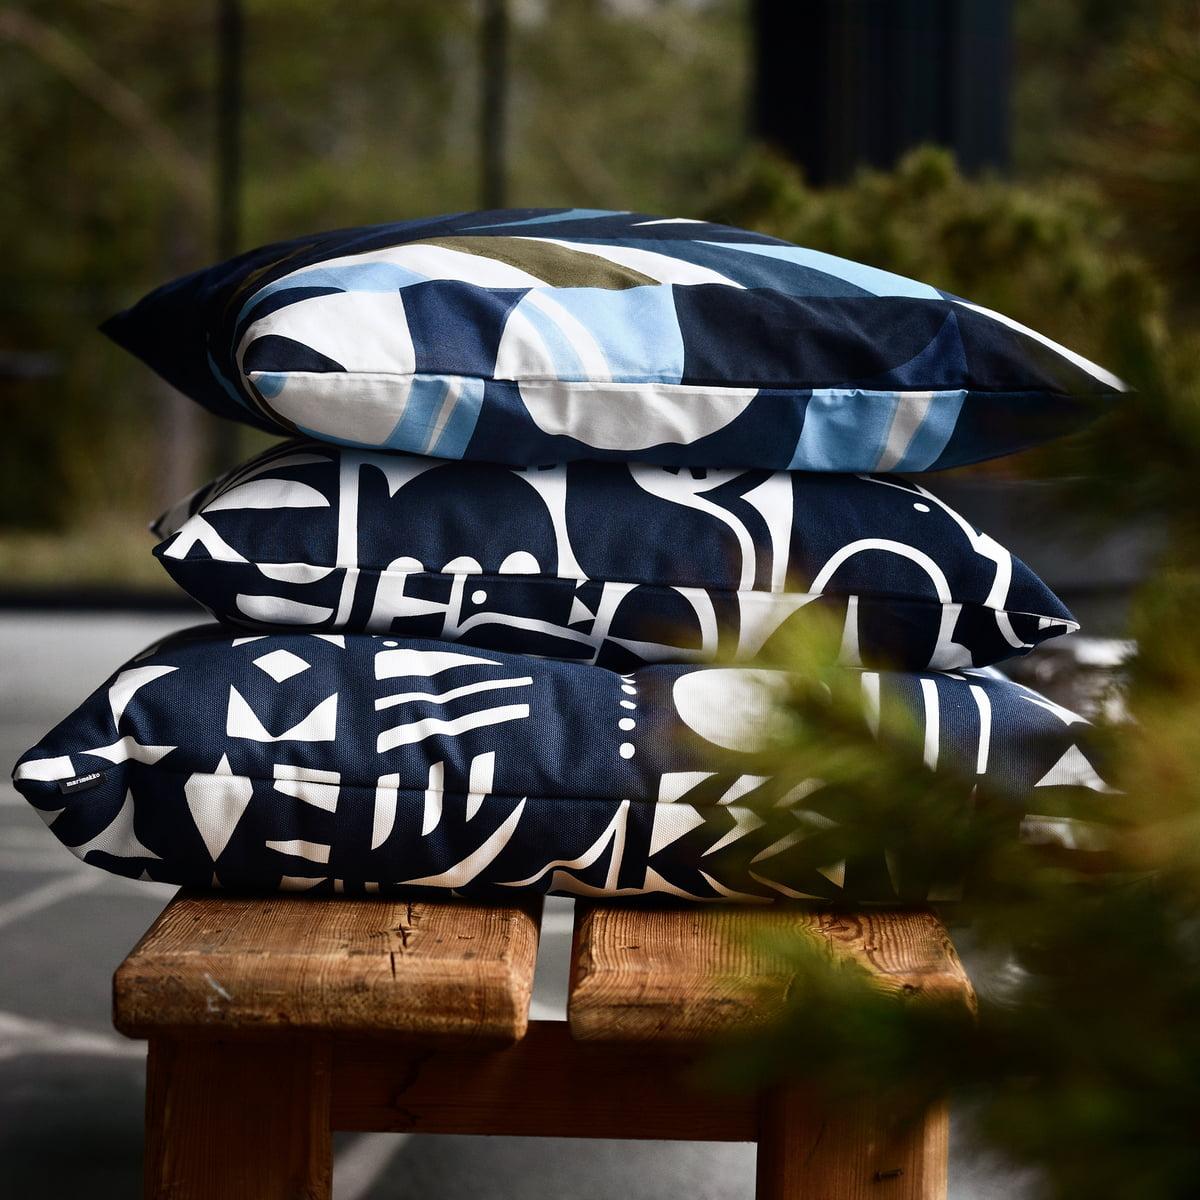 kissenhllen 50x50 elegant excellent knigsblau ornamente. Black Bedroom Furniture Sets. Home Design Ideas